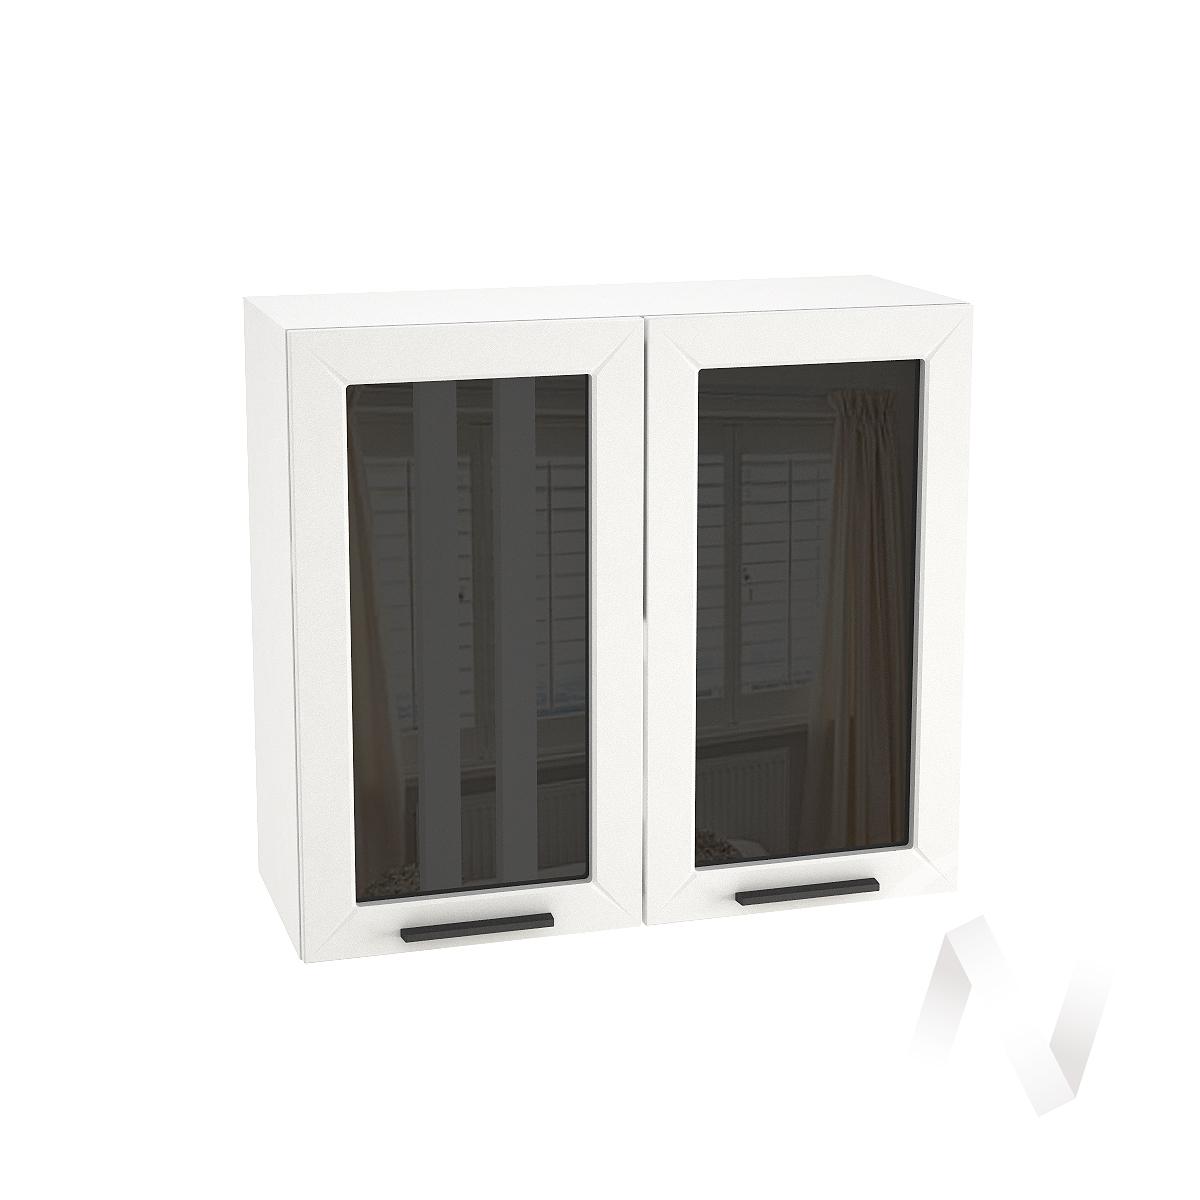 "Кухня ""Глетчер"": Шкаф верхний со стеклом 800, ШВС 800 (Айленд силк/корпус белый)"